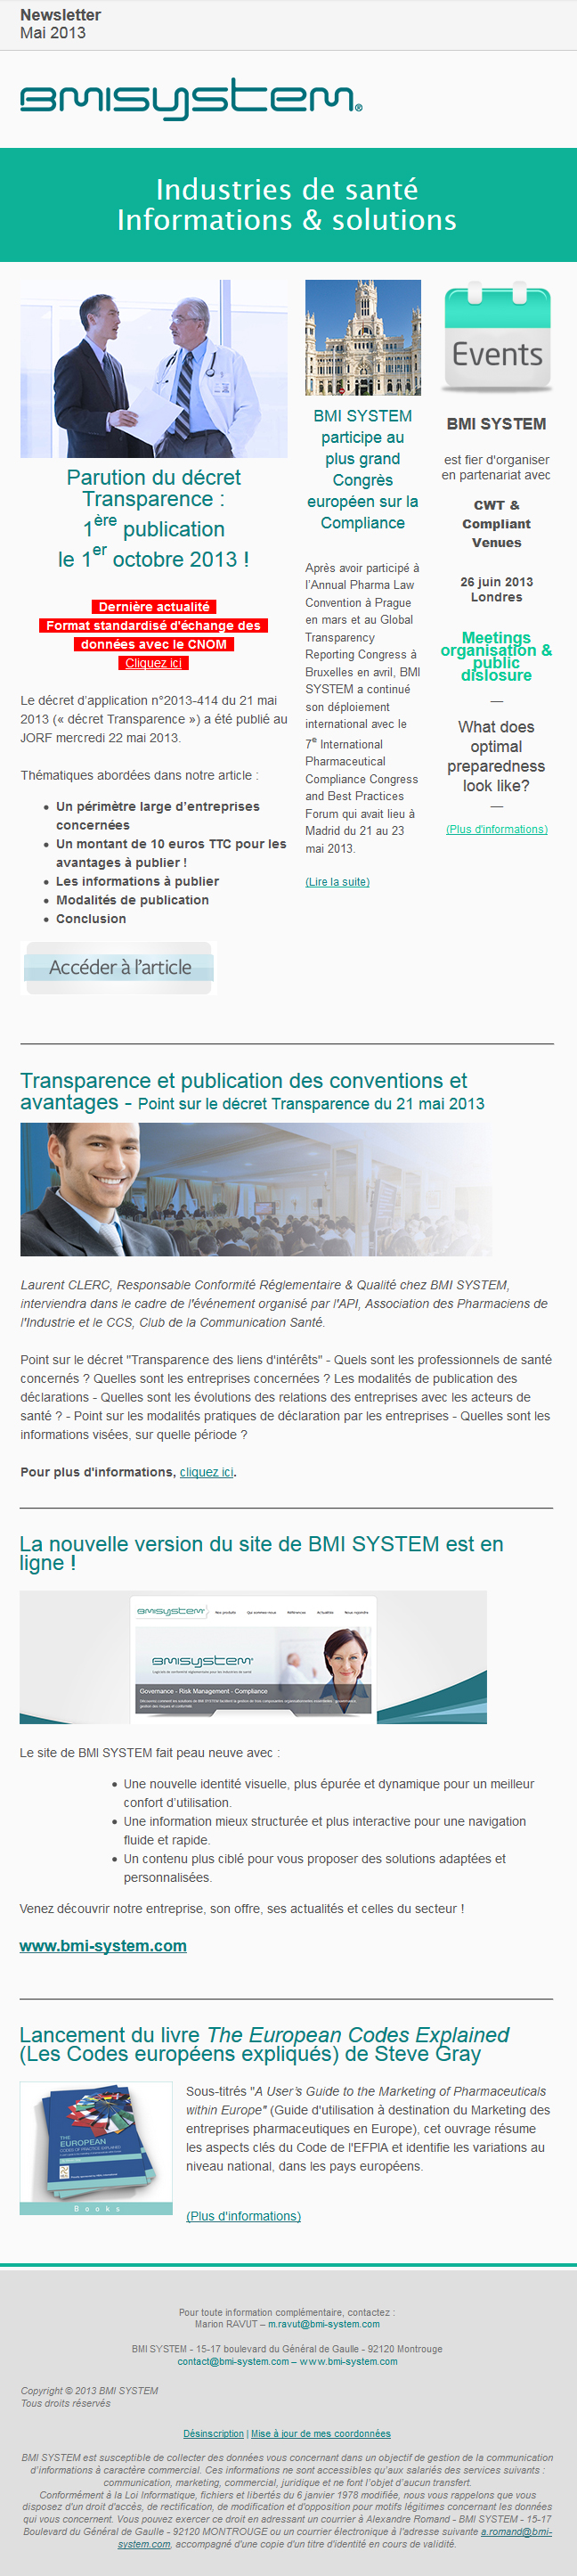 Newsletter mai 2013